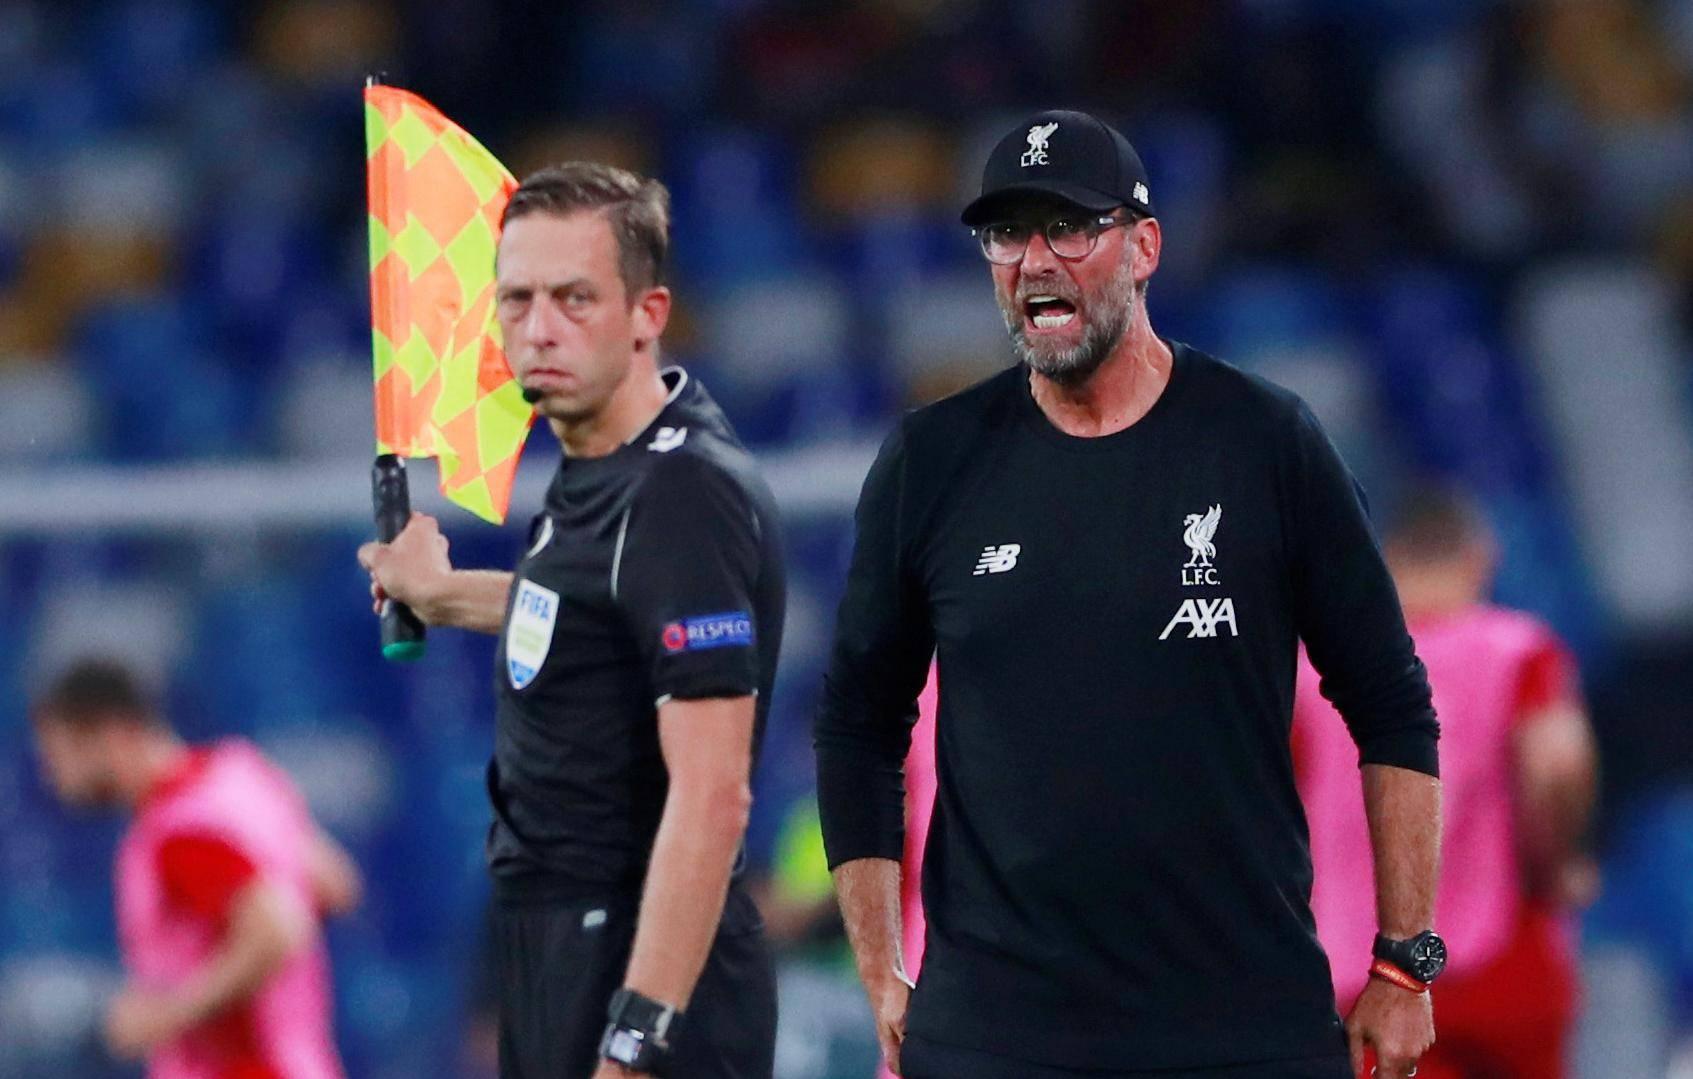 Champions League - Group E - Napoli v Liverpool